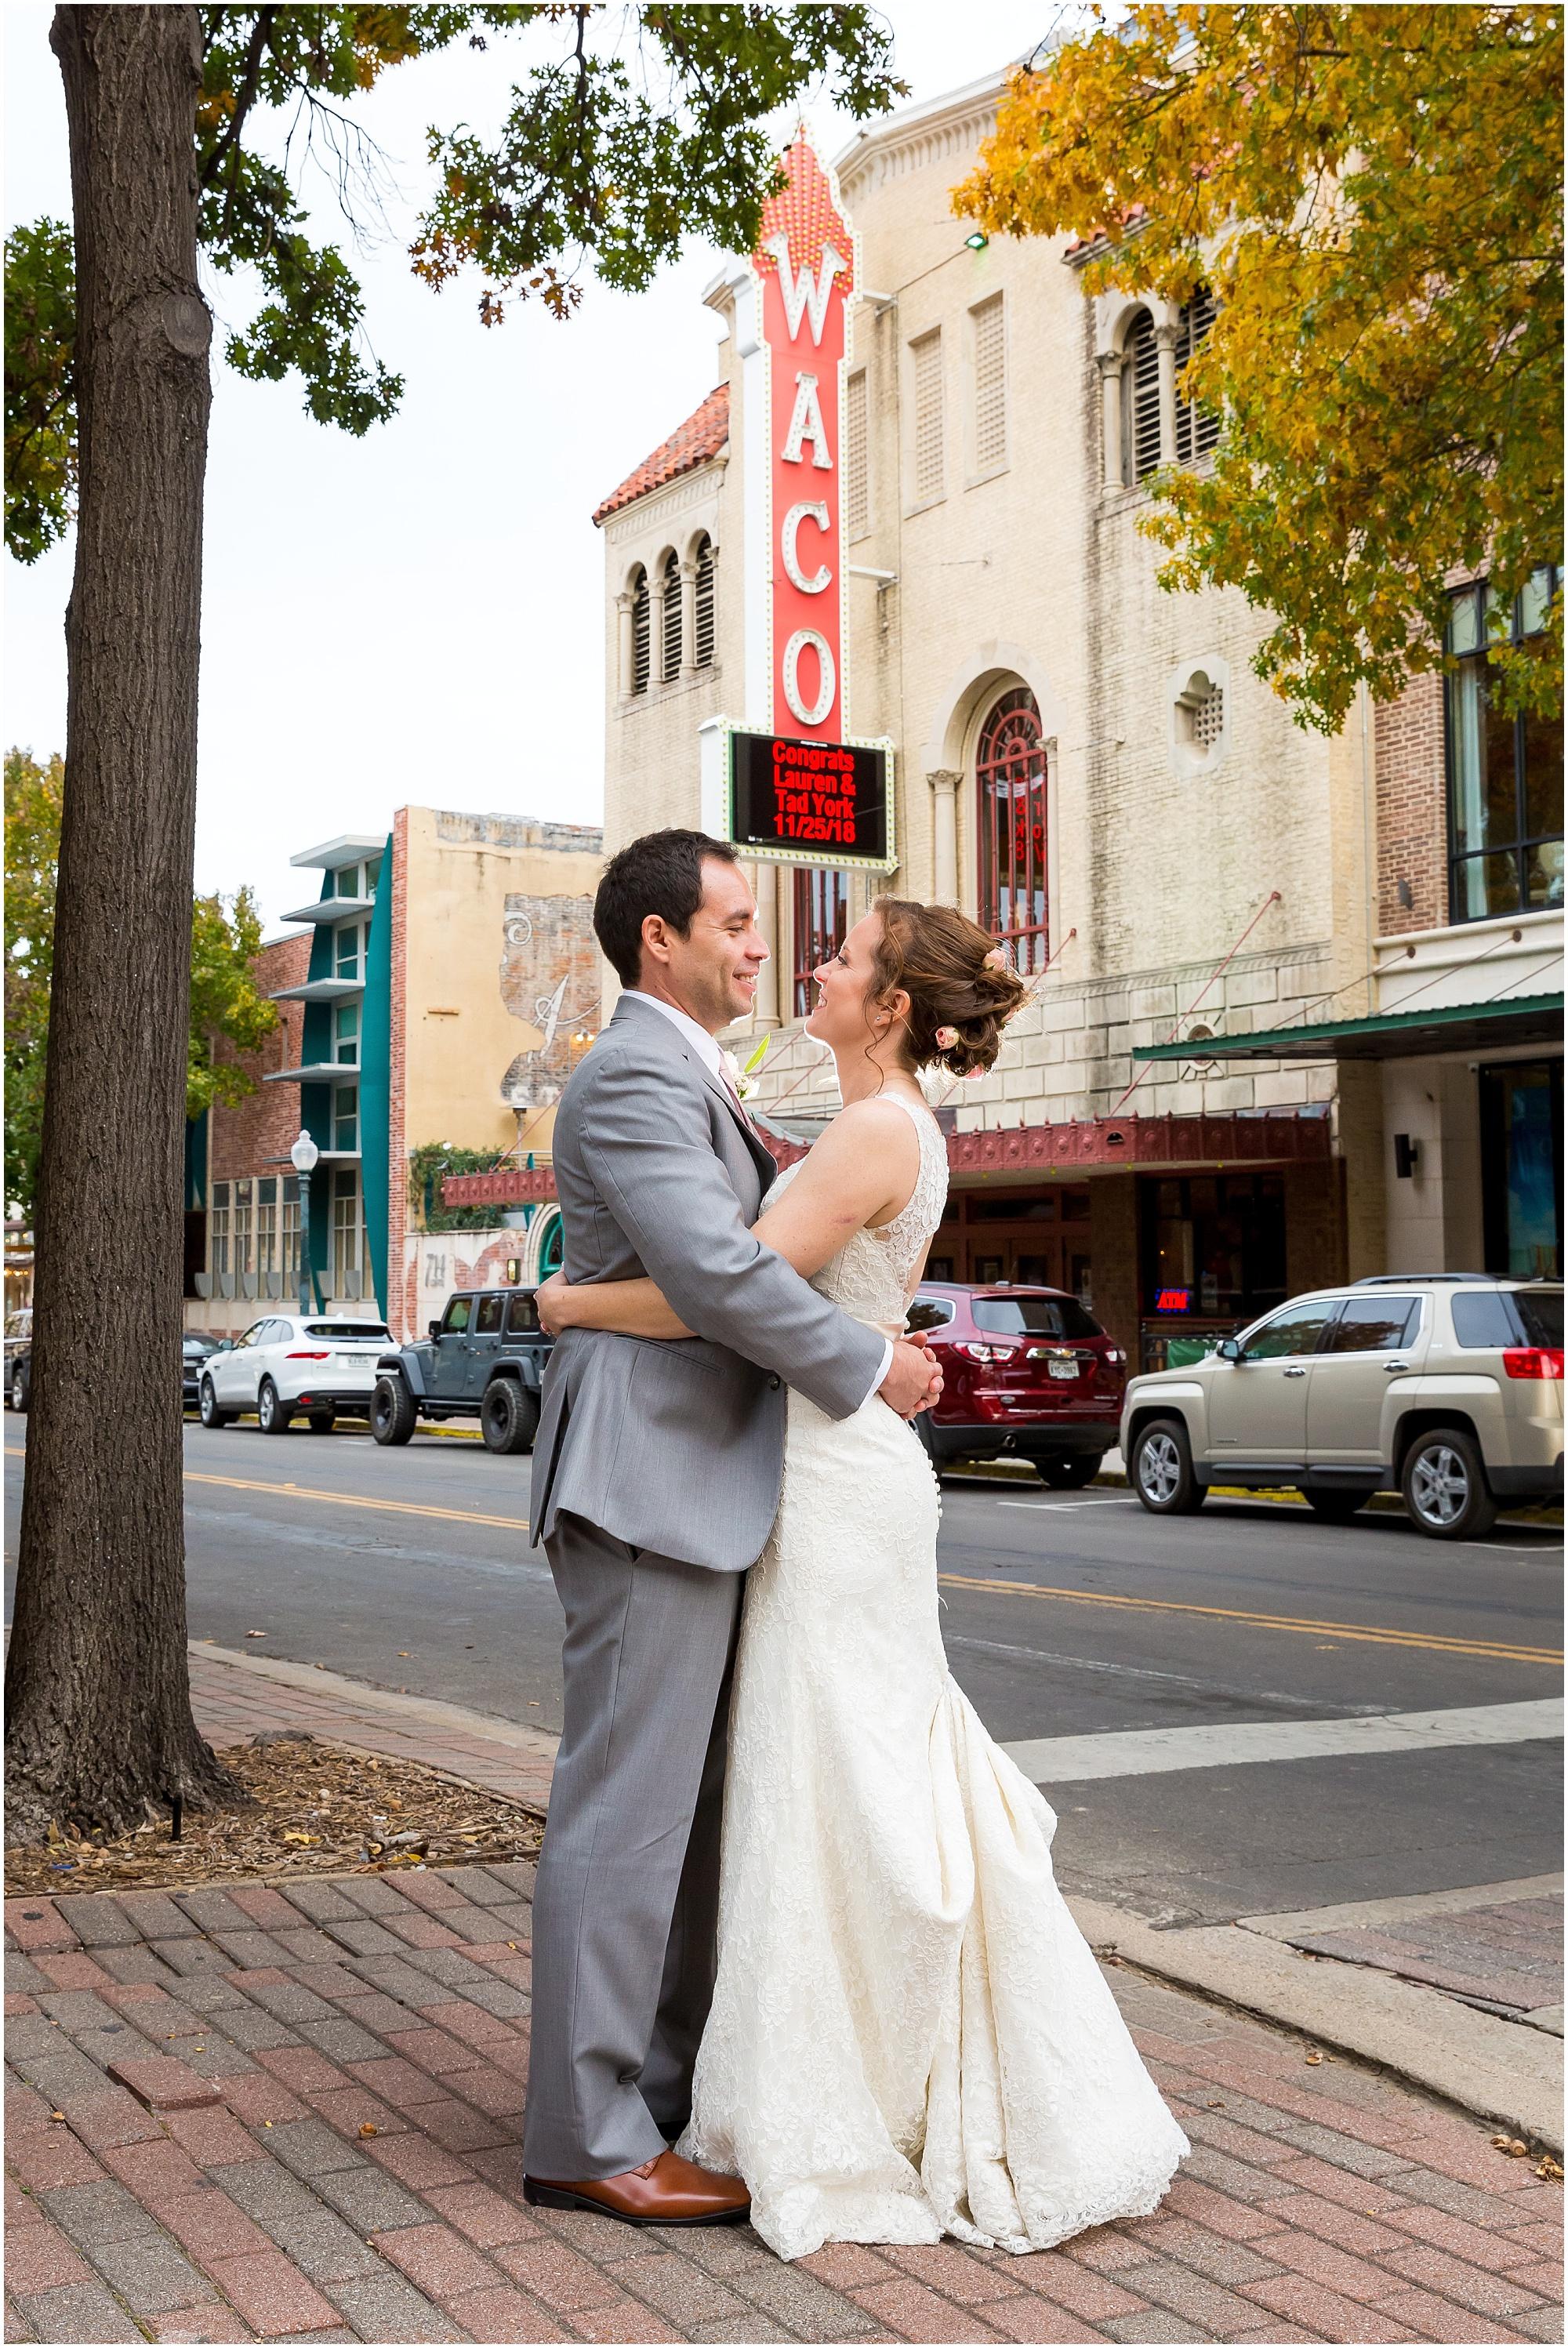 Bride and groom with their names on the Hippodrome Marquee in Waco, Texas - Jason & Melaina Photography - www.jasonandmelaina.com